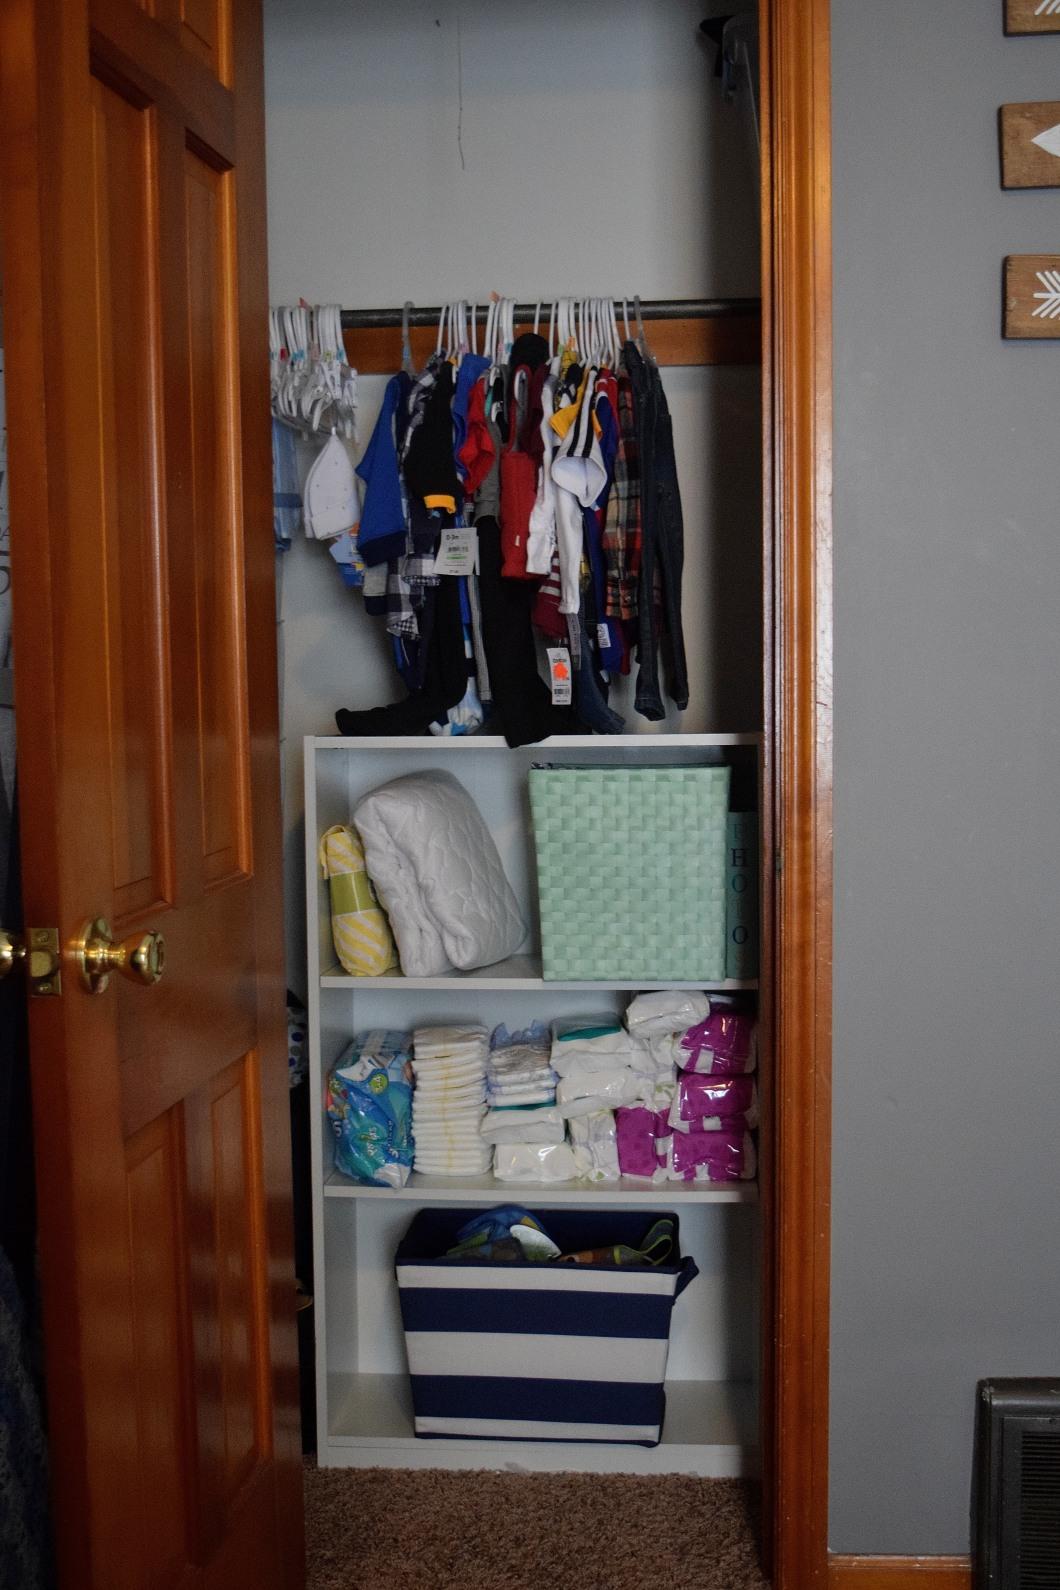 DSC_0989n closet.JPG